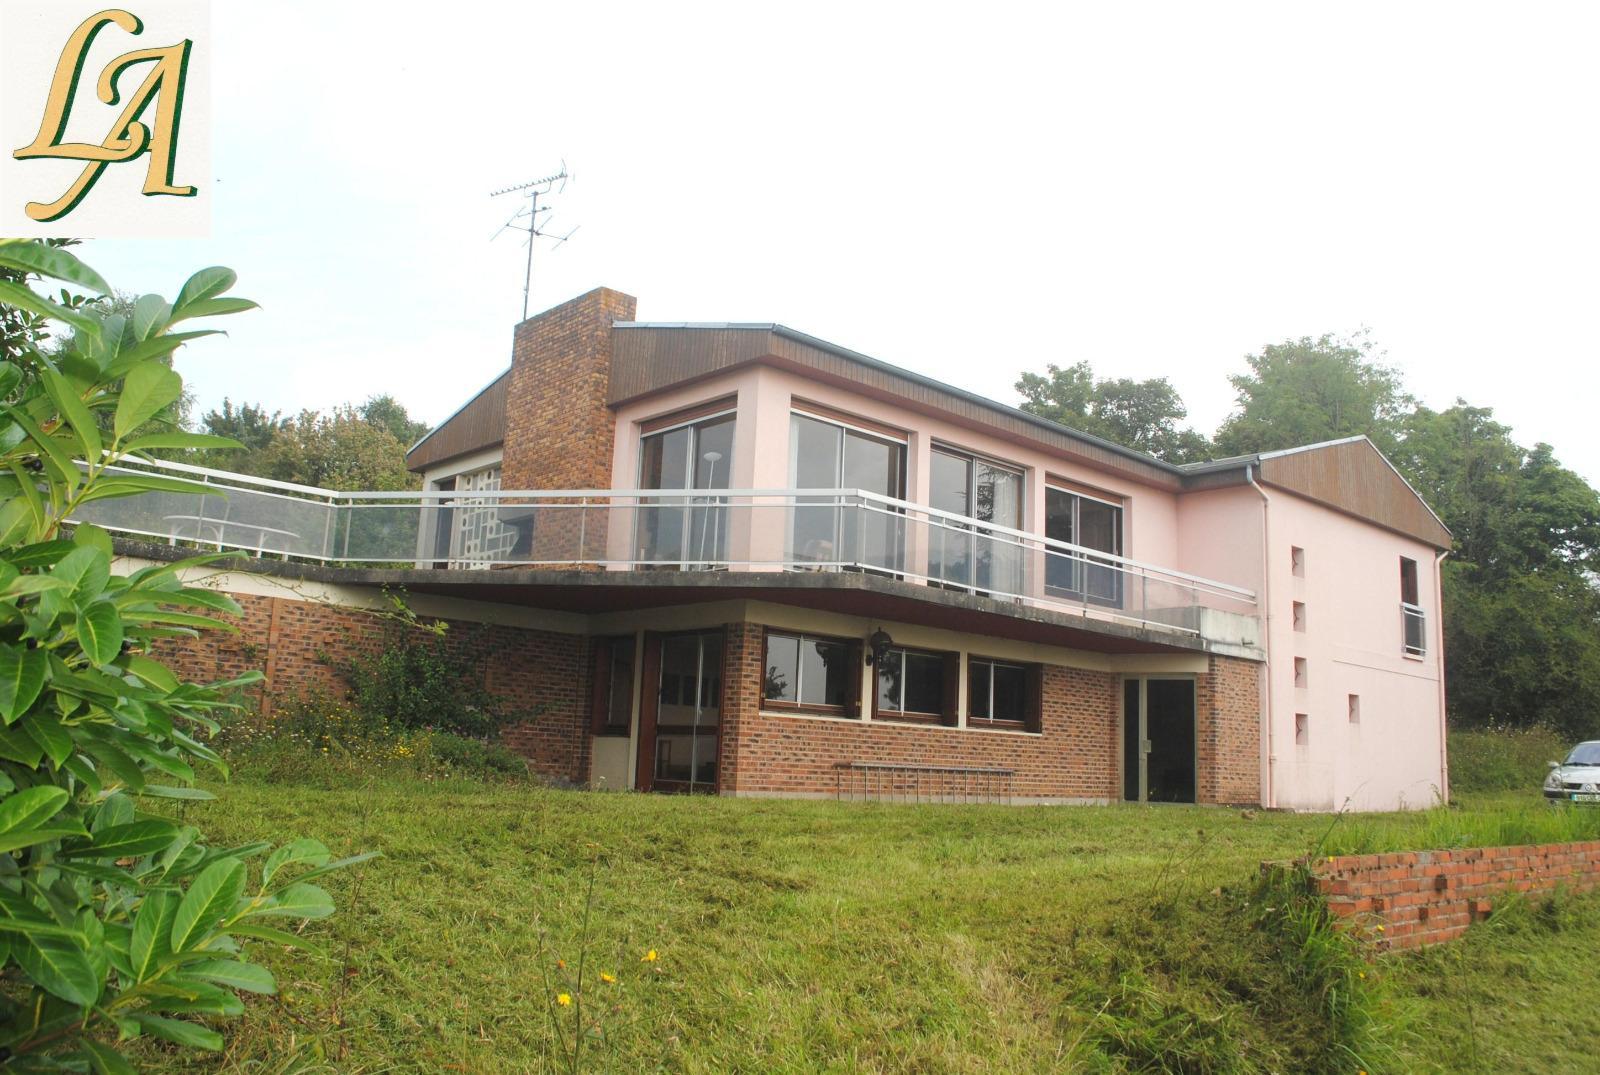 Vente maison contemporaine 5 mn pacy for Vente maison moderne